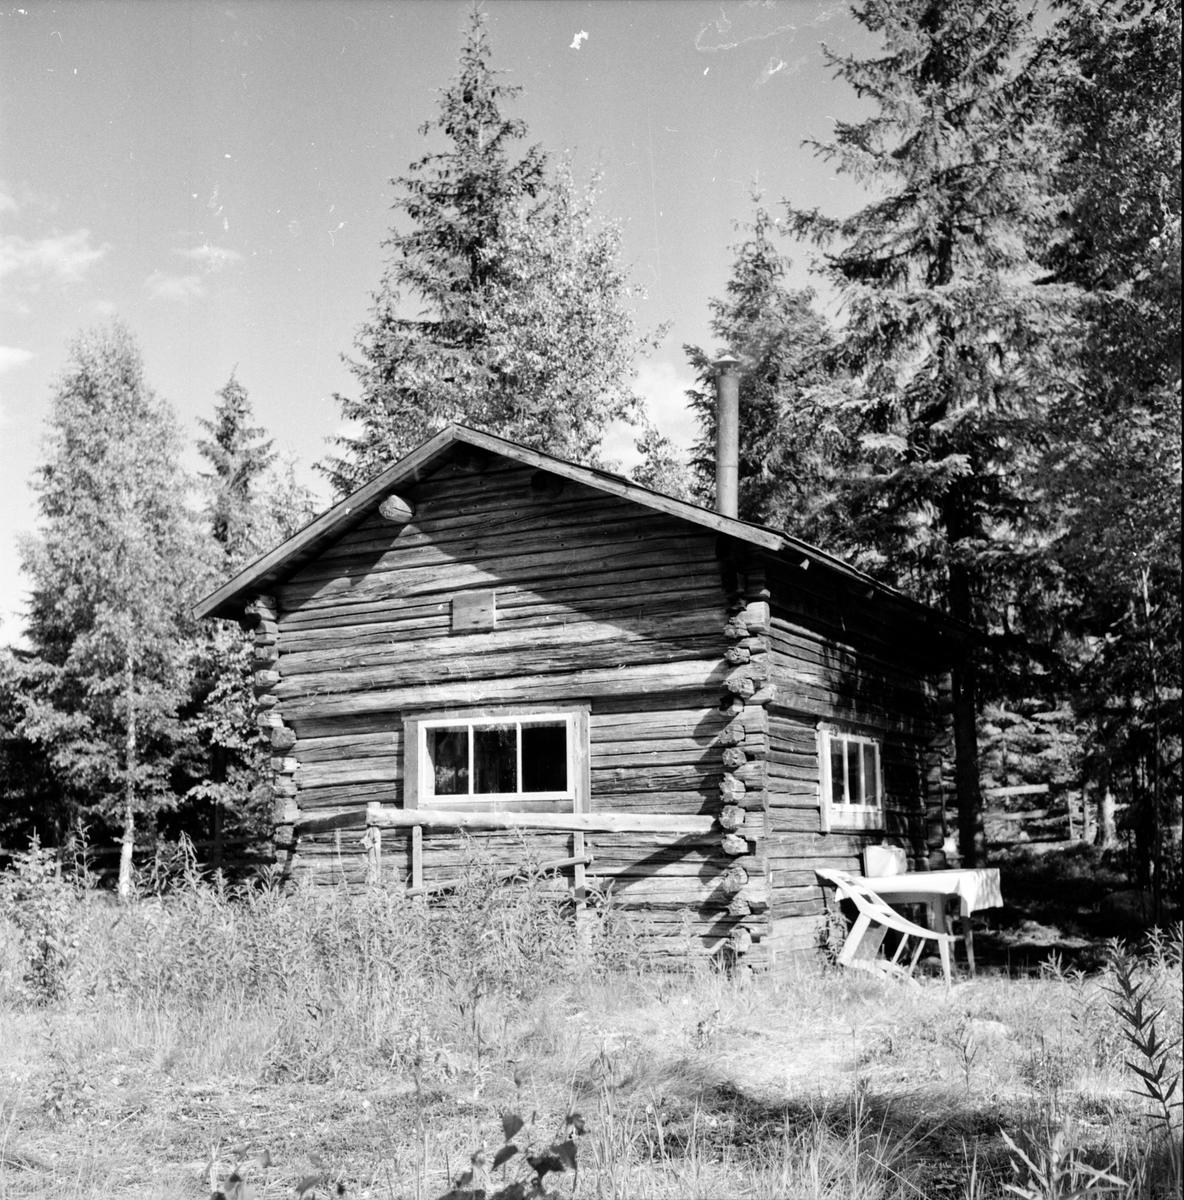 Lindin Ester, Stuga, Vallåsen, 2 Juli 1956